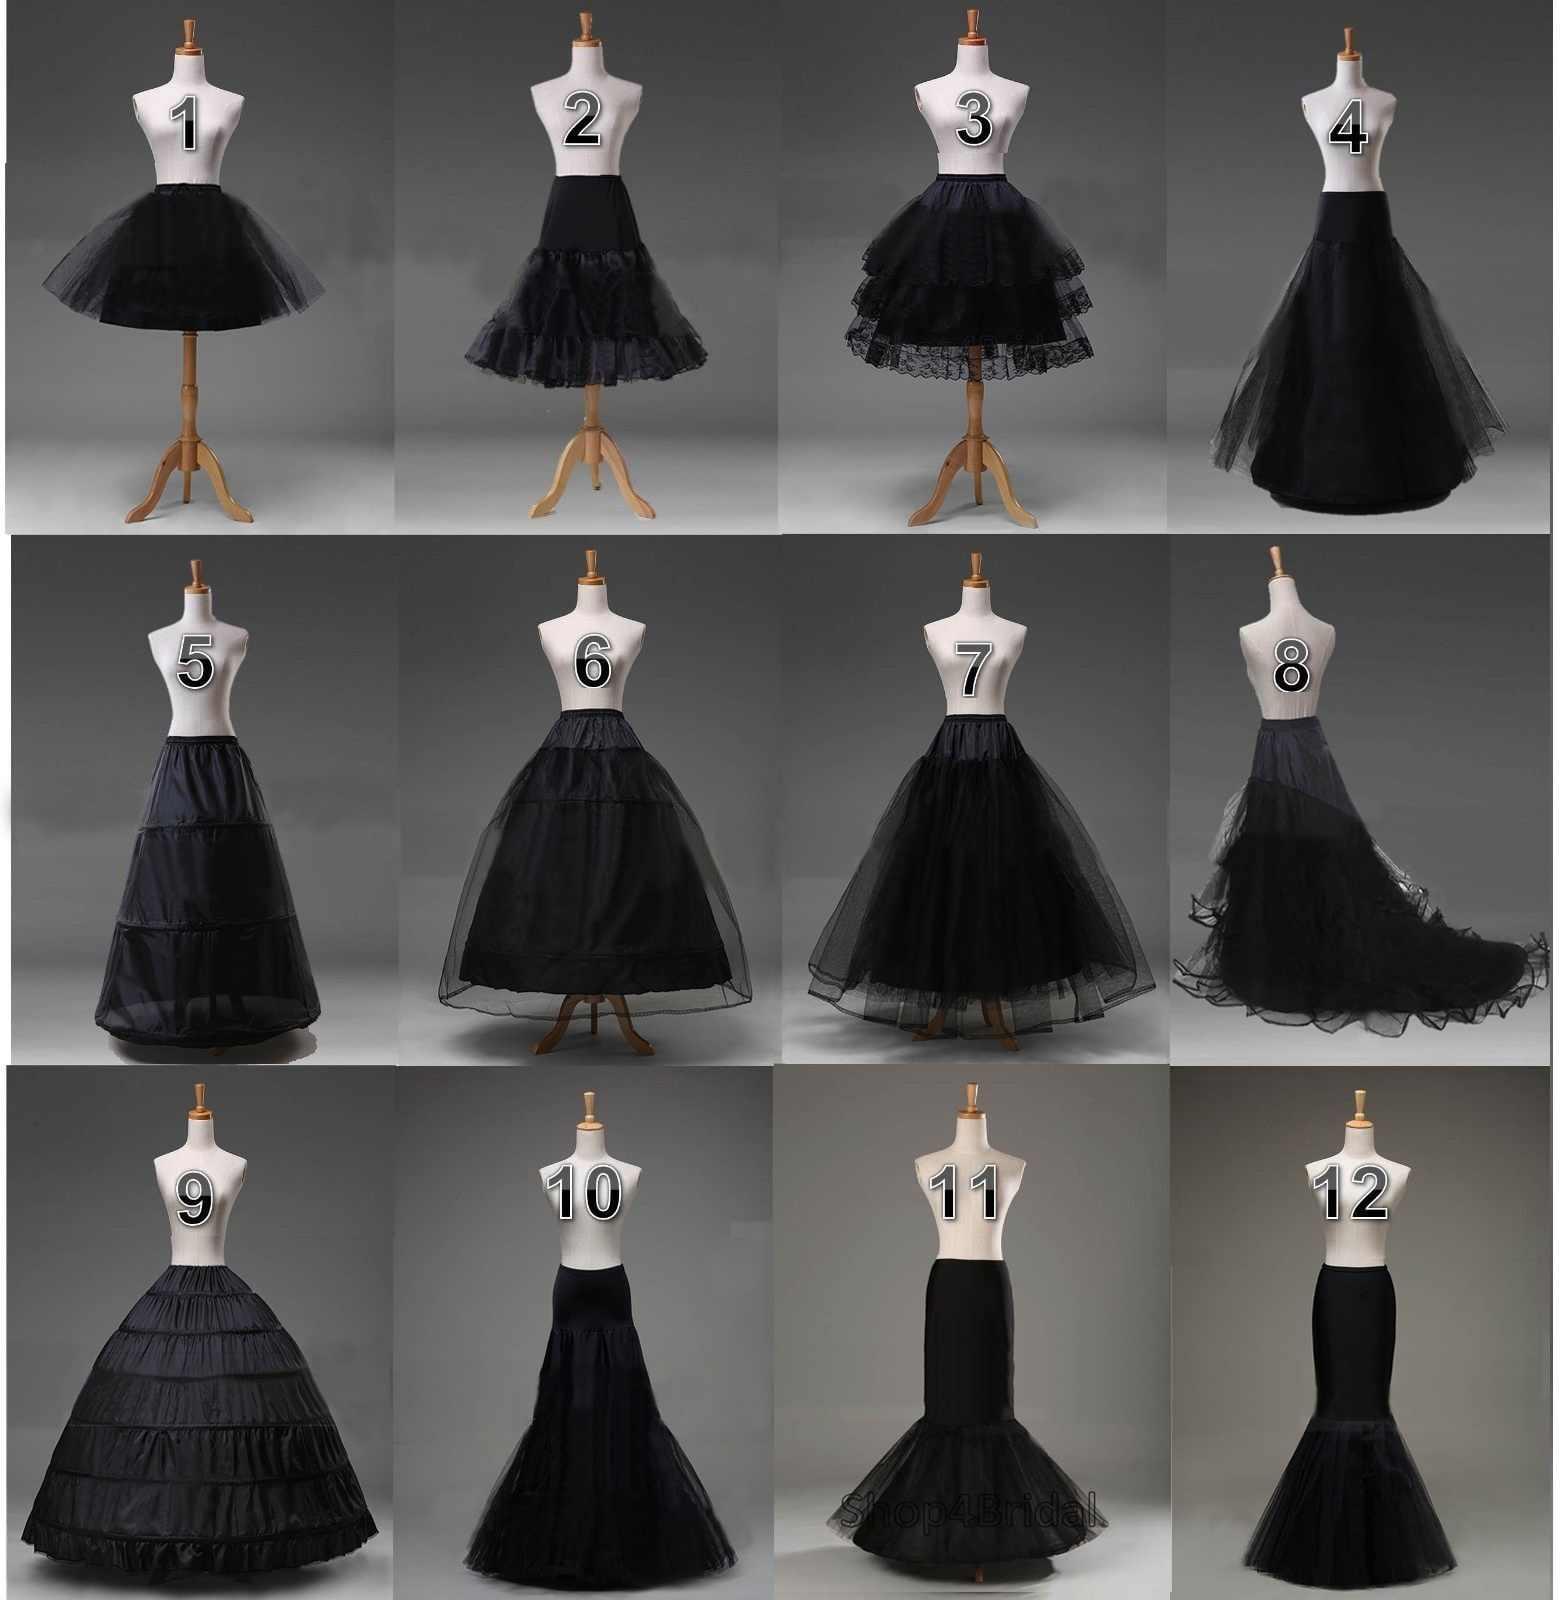 fddc554b51b8 Black Bridal Petticoat Crinoline Underskirt Hoop/Hoopless/Mermaid/Fishtail